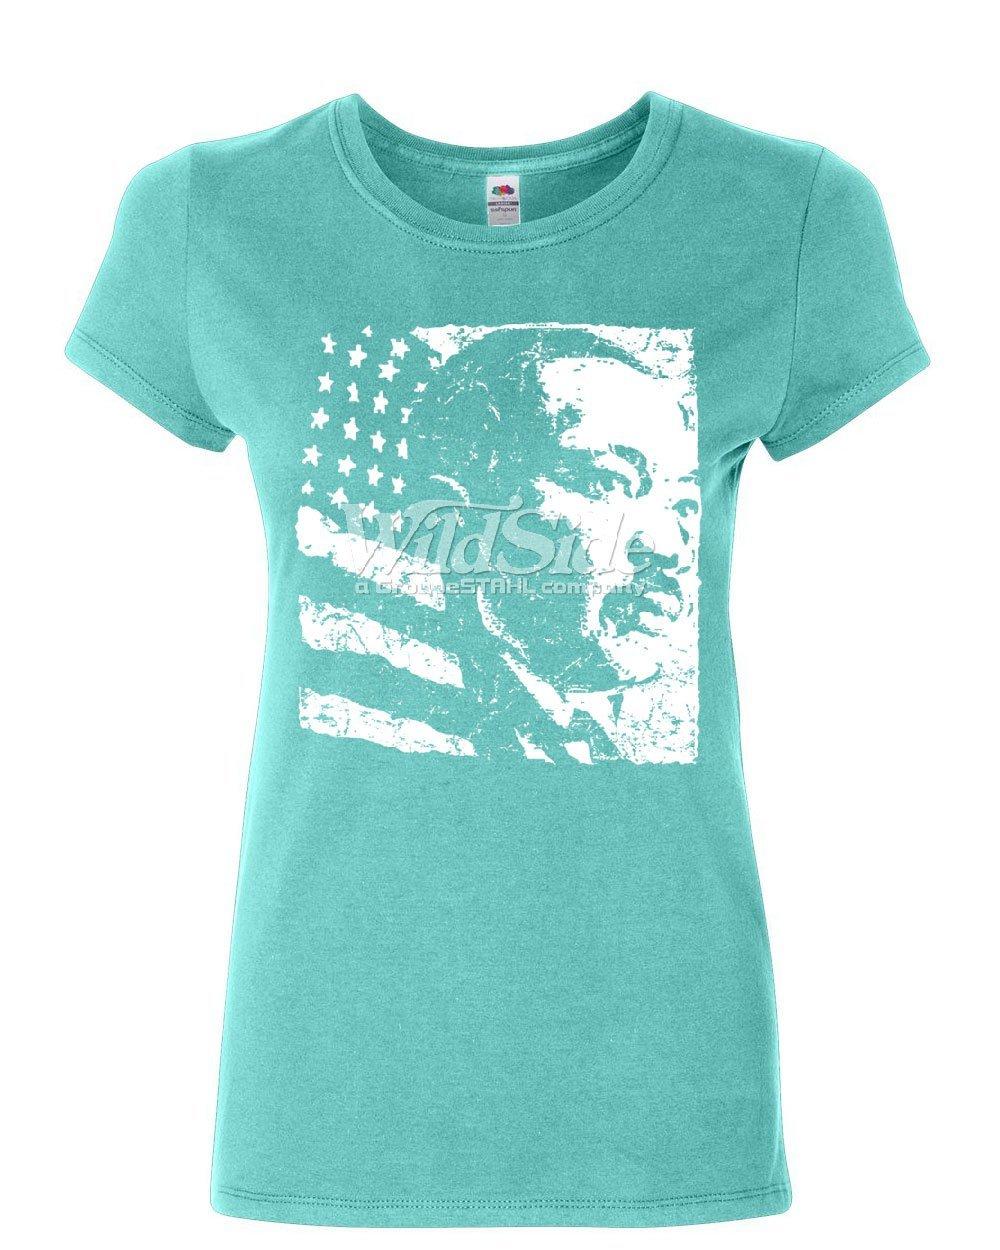 Dr Martin Luther King Jr T Shirt Us Hero Civil Rights Movet Shirt 8214